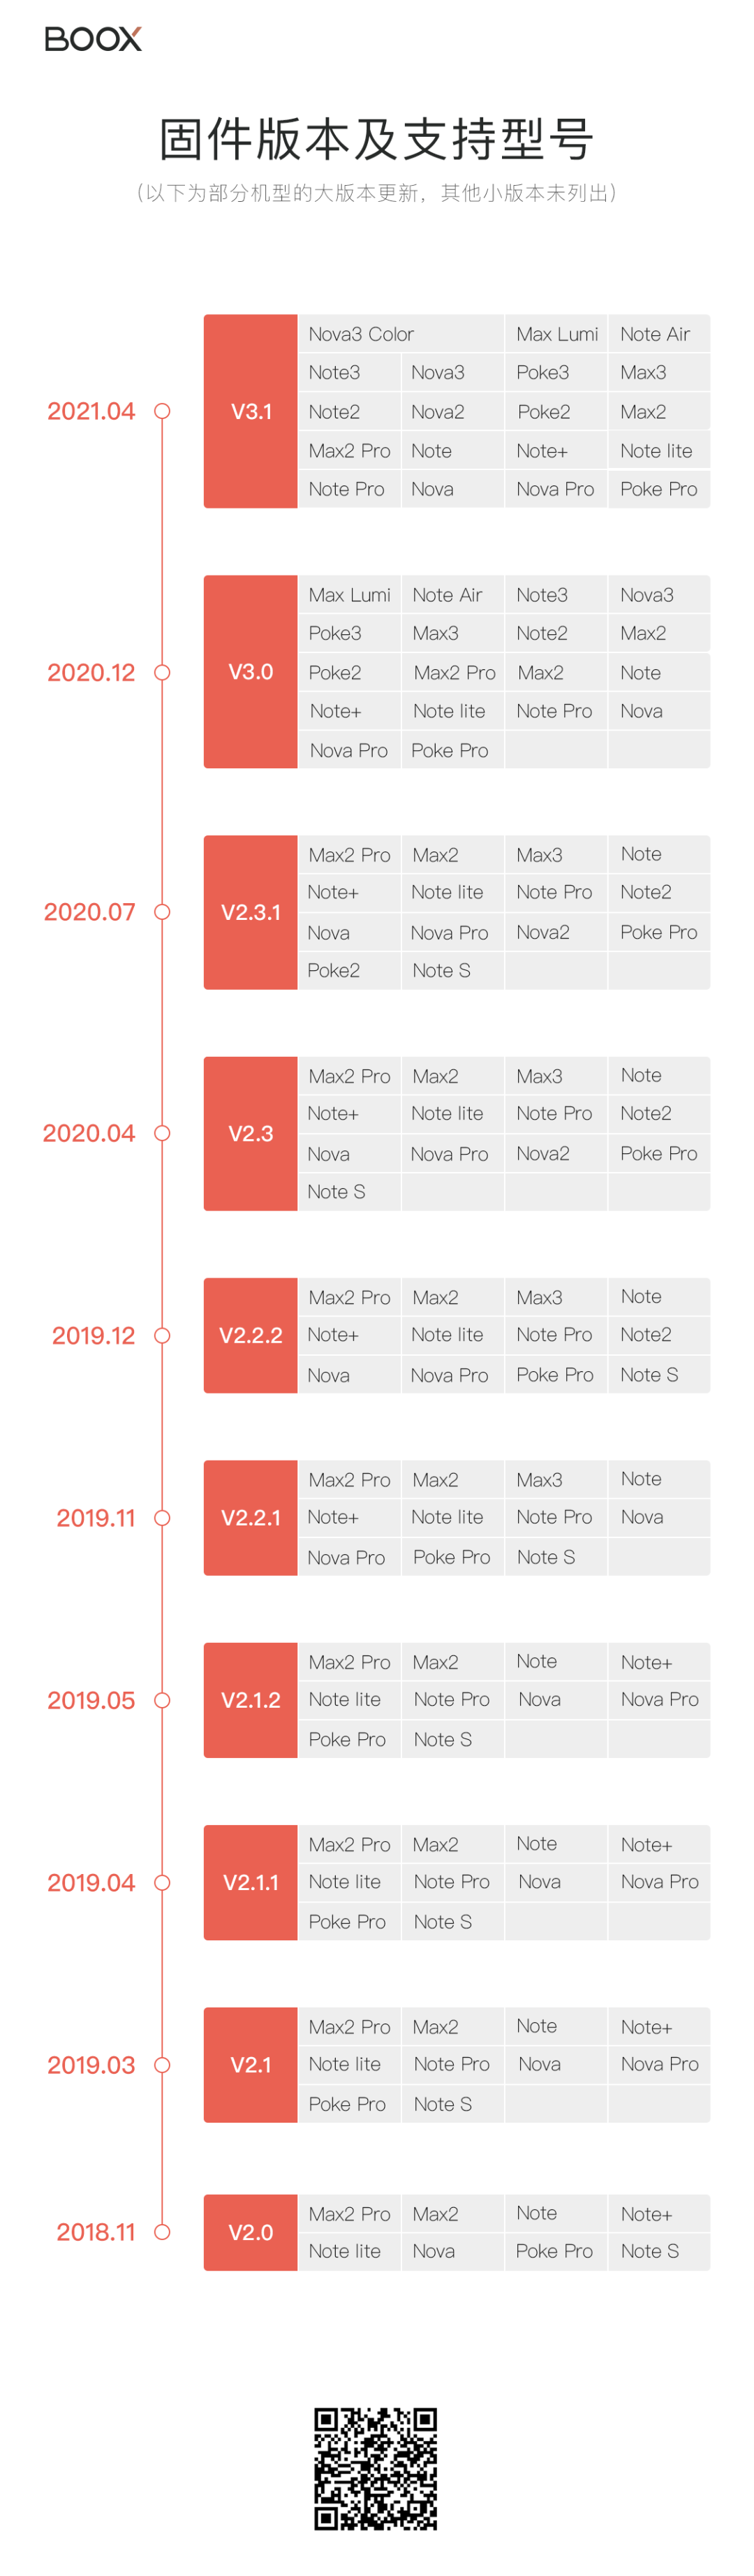 Boox 韌體版本型號對照表